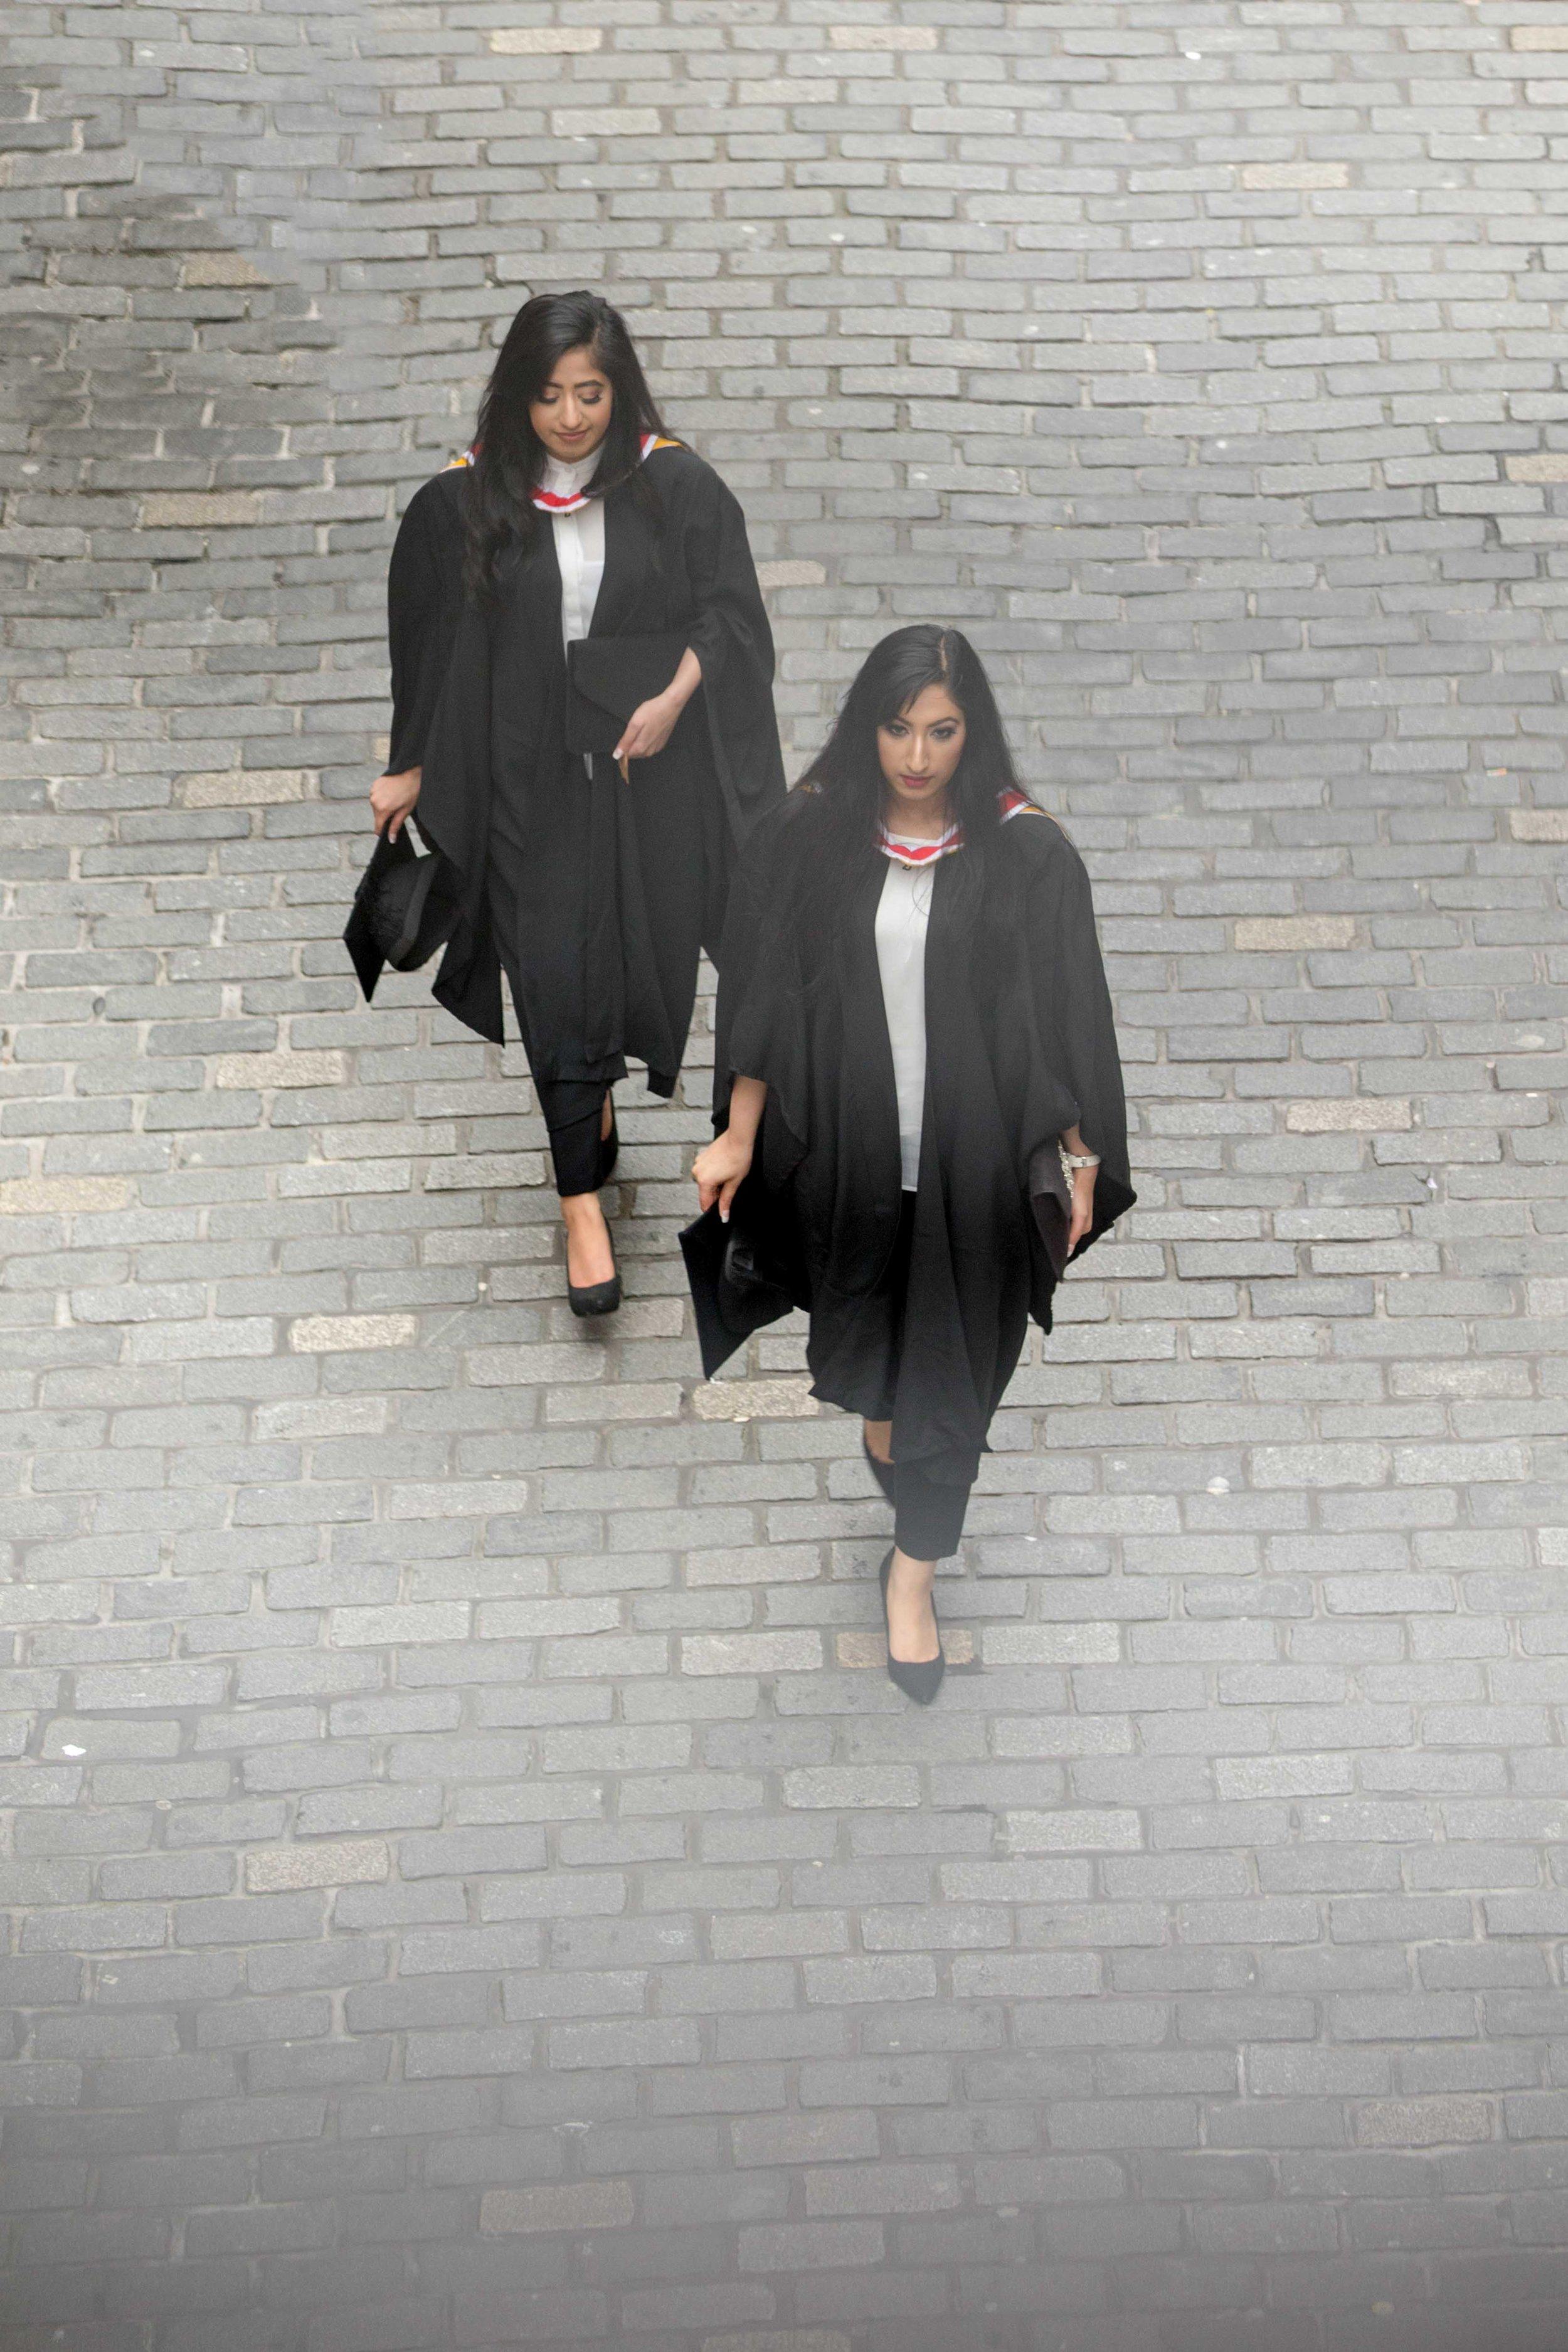 chester-university-graduation-ceremony-photography-photoshoot-graduation-photographer-Bristol-London-Cardiff-Birmingham-Chester-Natalia-smith-photography-8.jpg